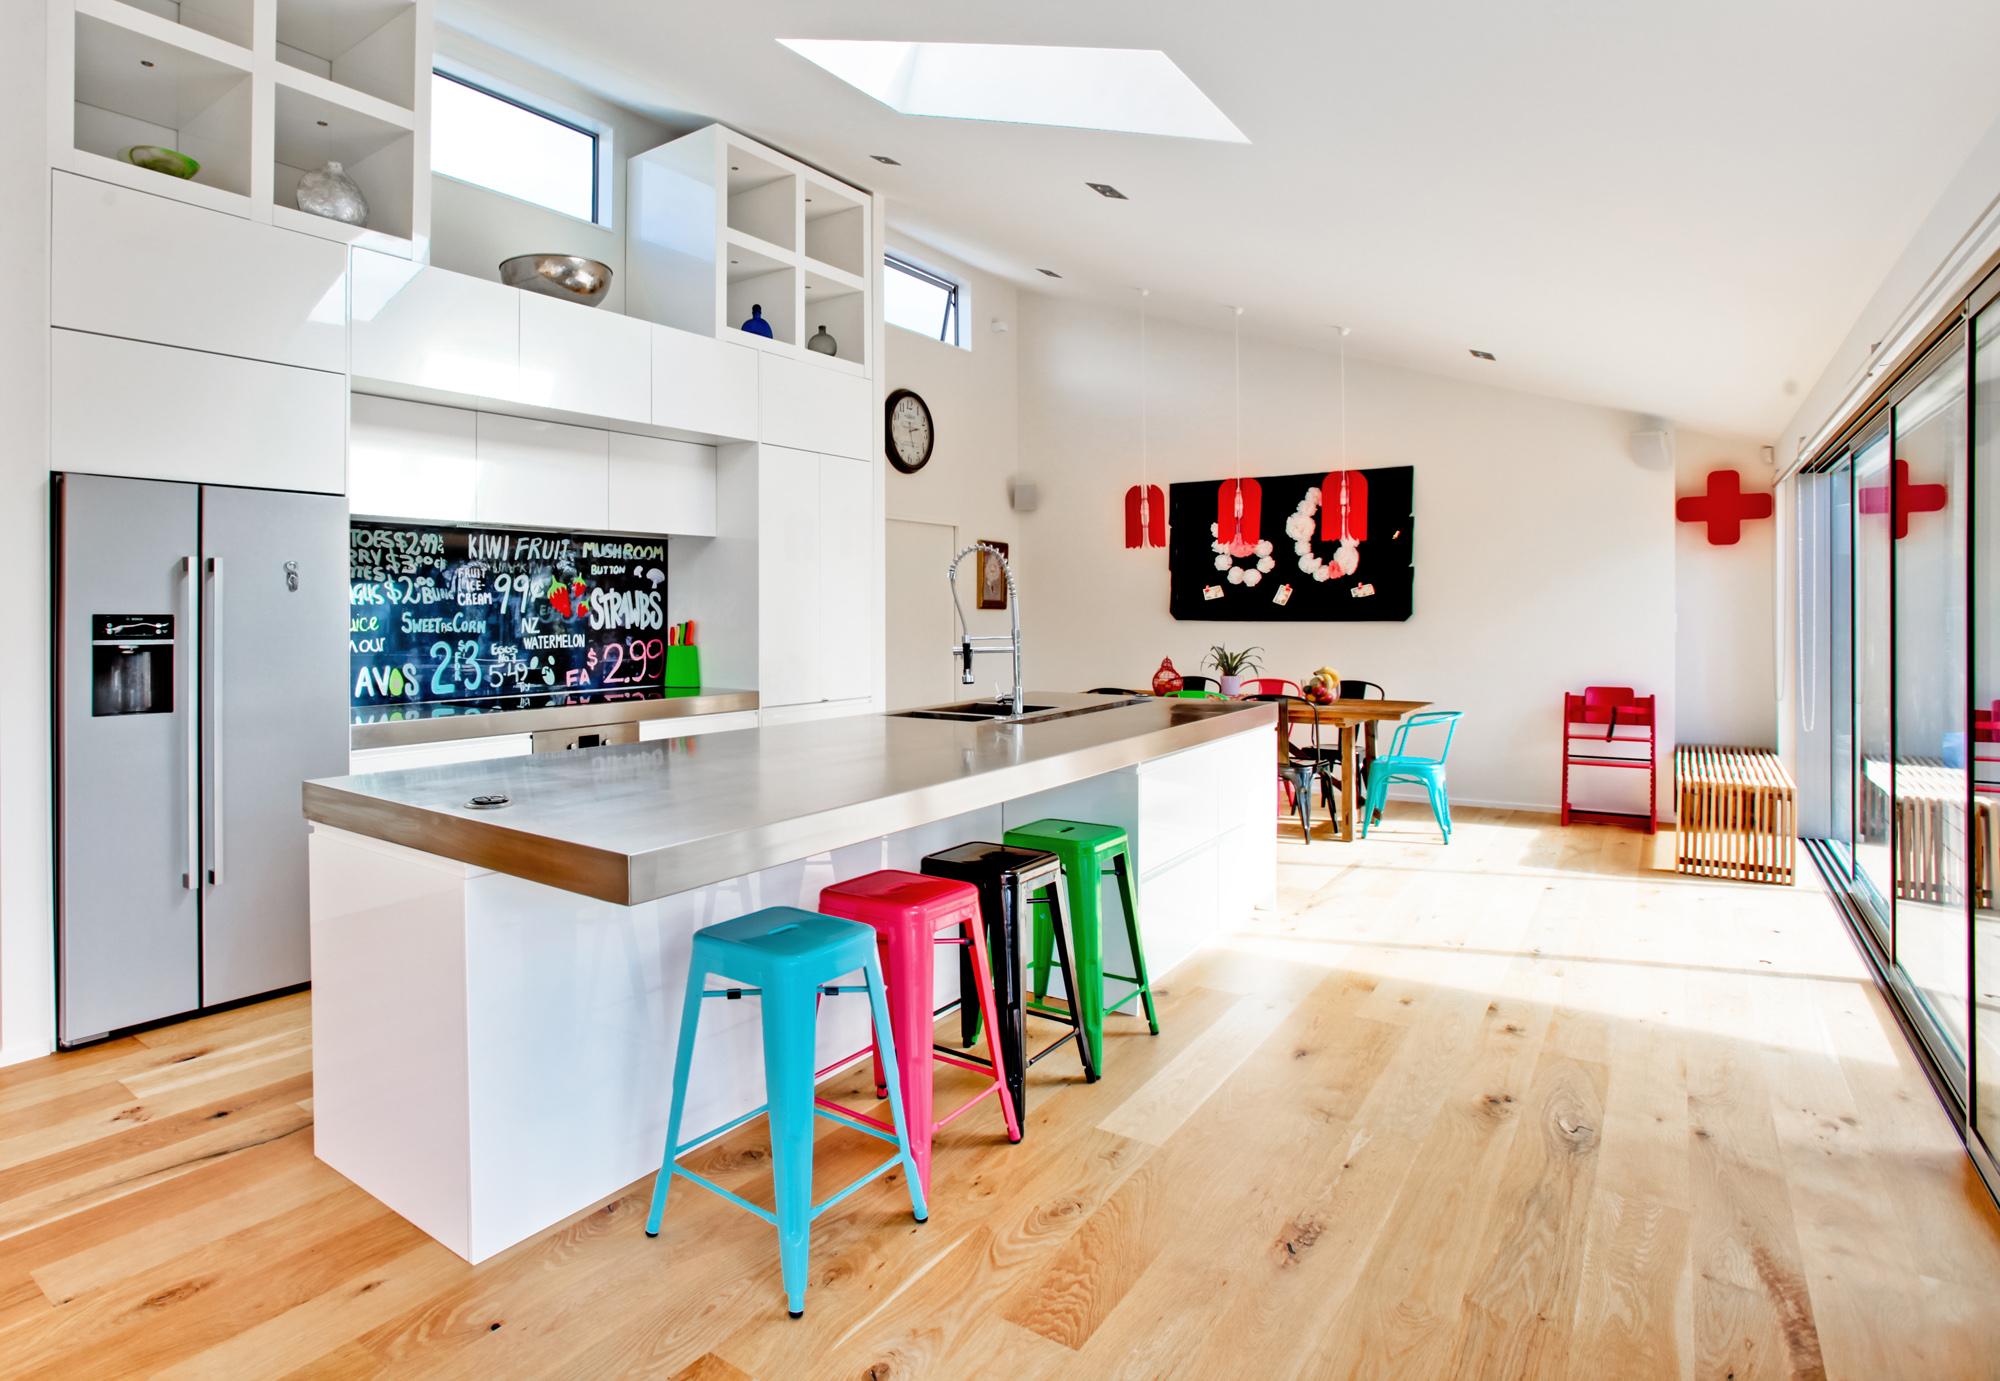 Printed 'image on glass' kitchen splashback by Lucy G